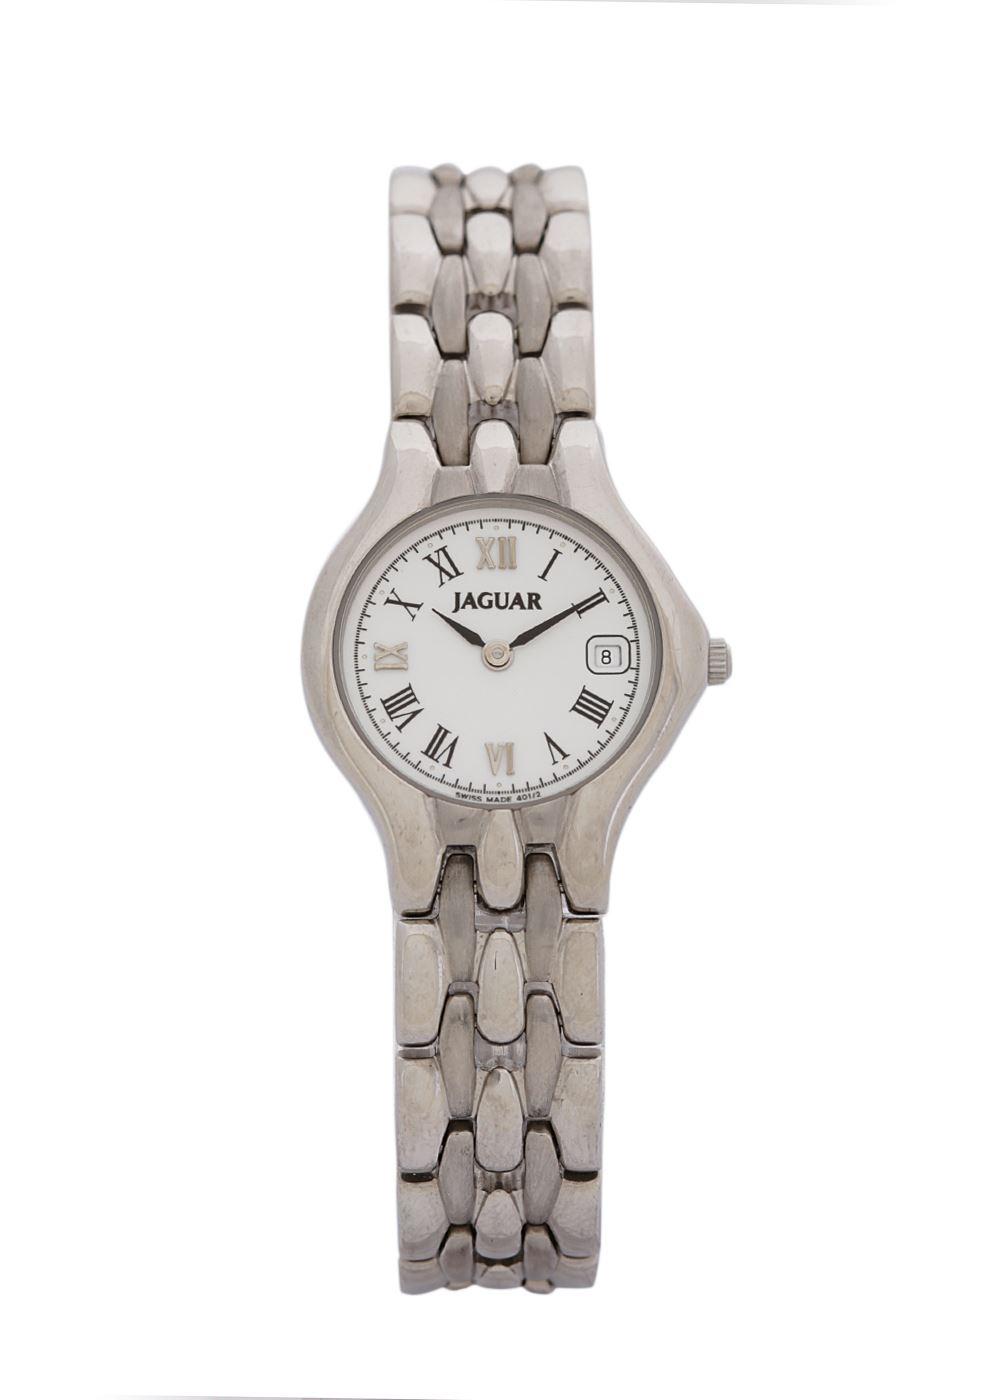 Jaguar & More - Γυναικείο Ρολόι JAGUAR